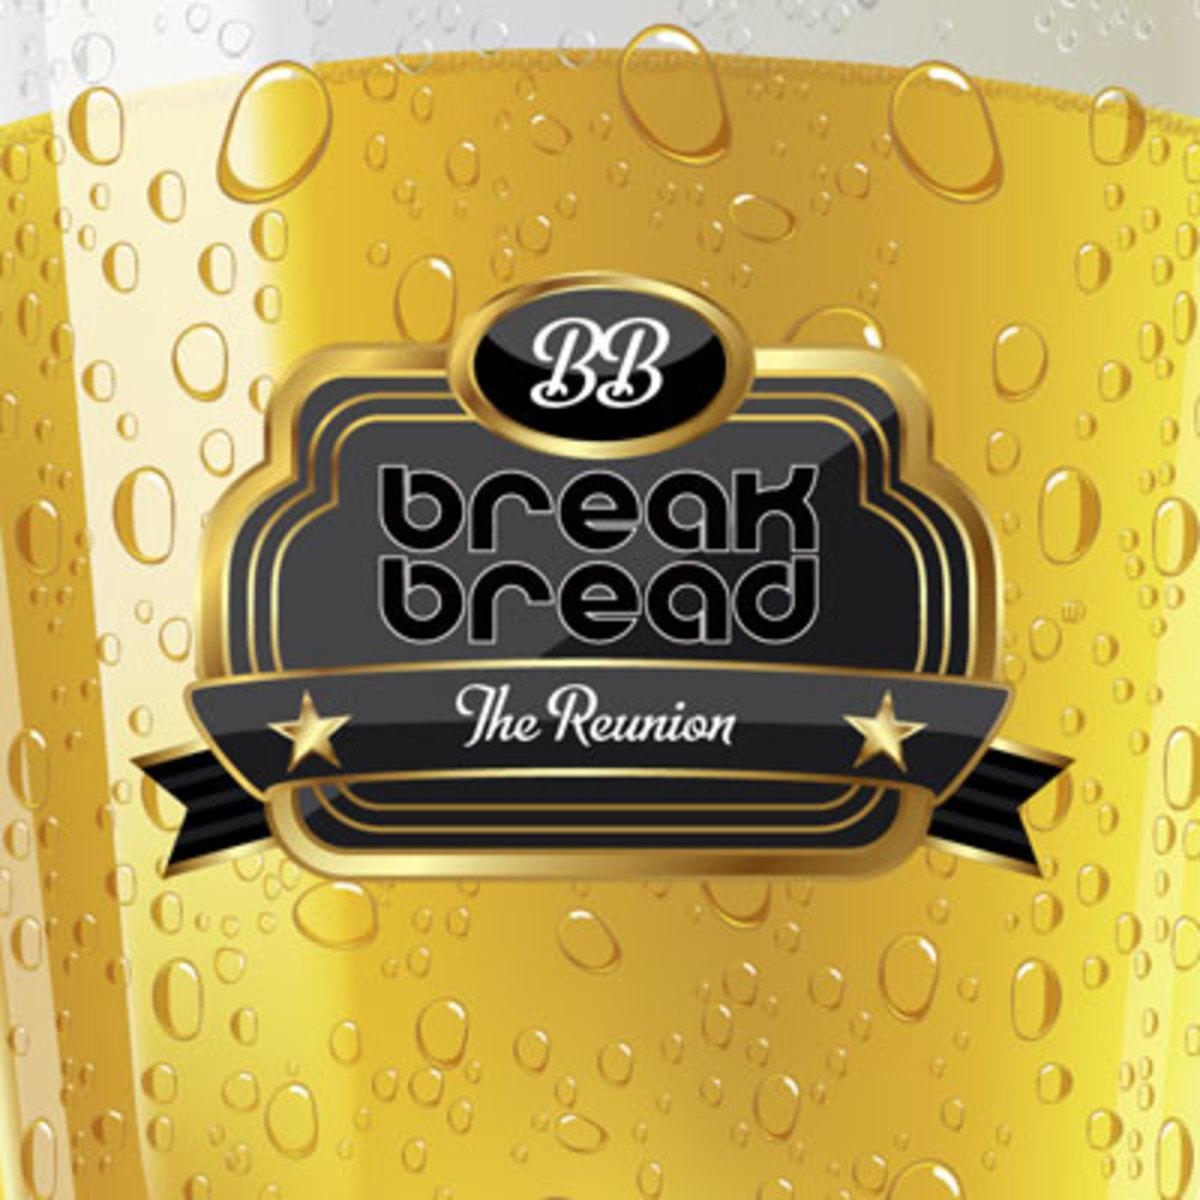 breakbread-thereunion.jpg